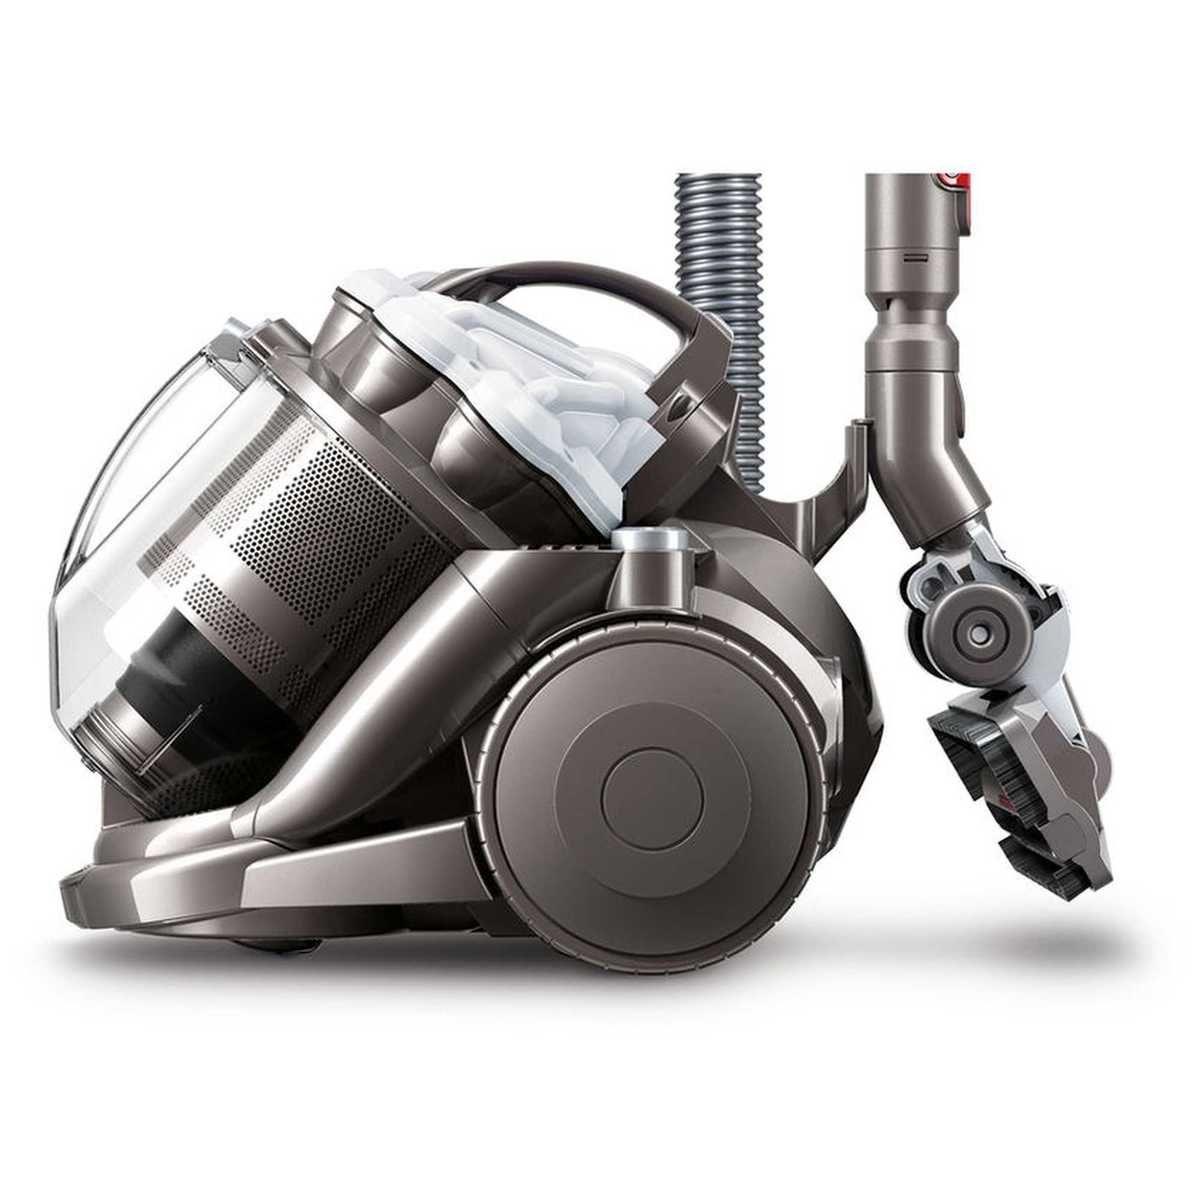 Dyson Dc29 Multi Floor Barrel Vacuum Cleaner Big W